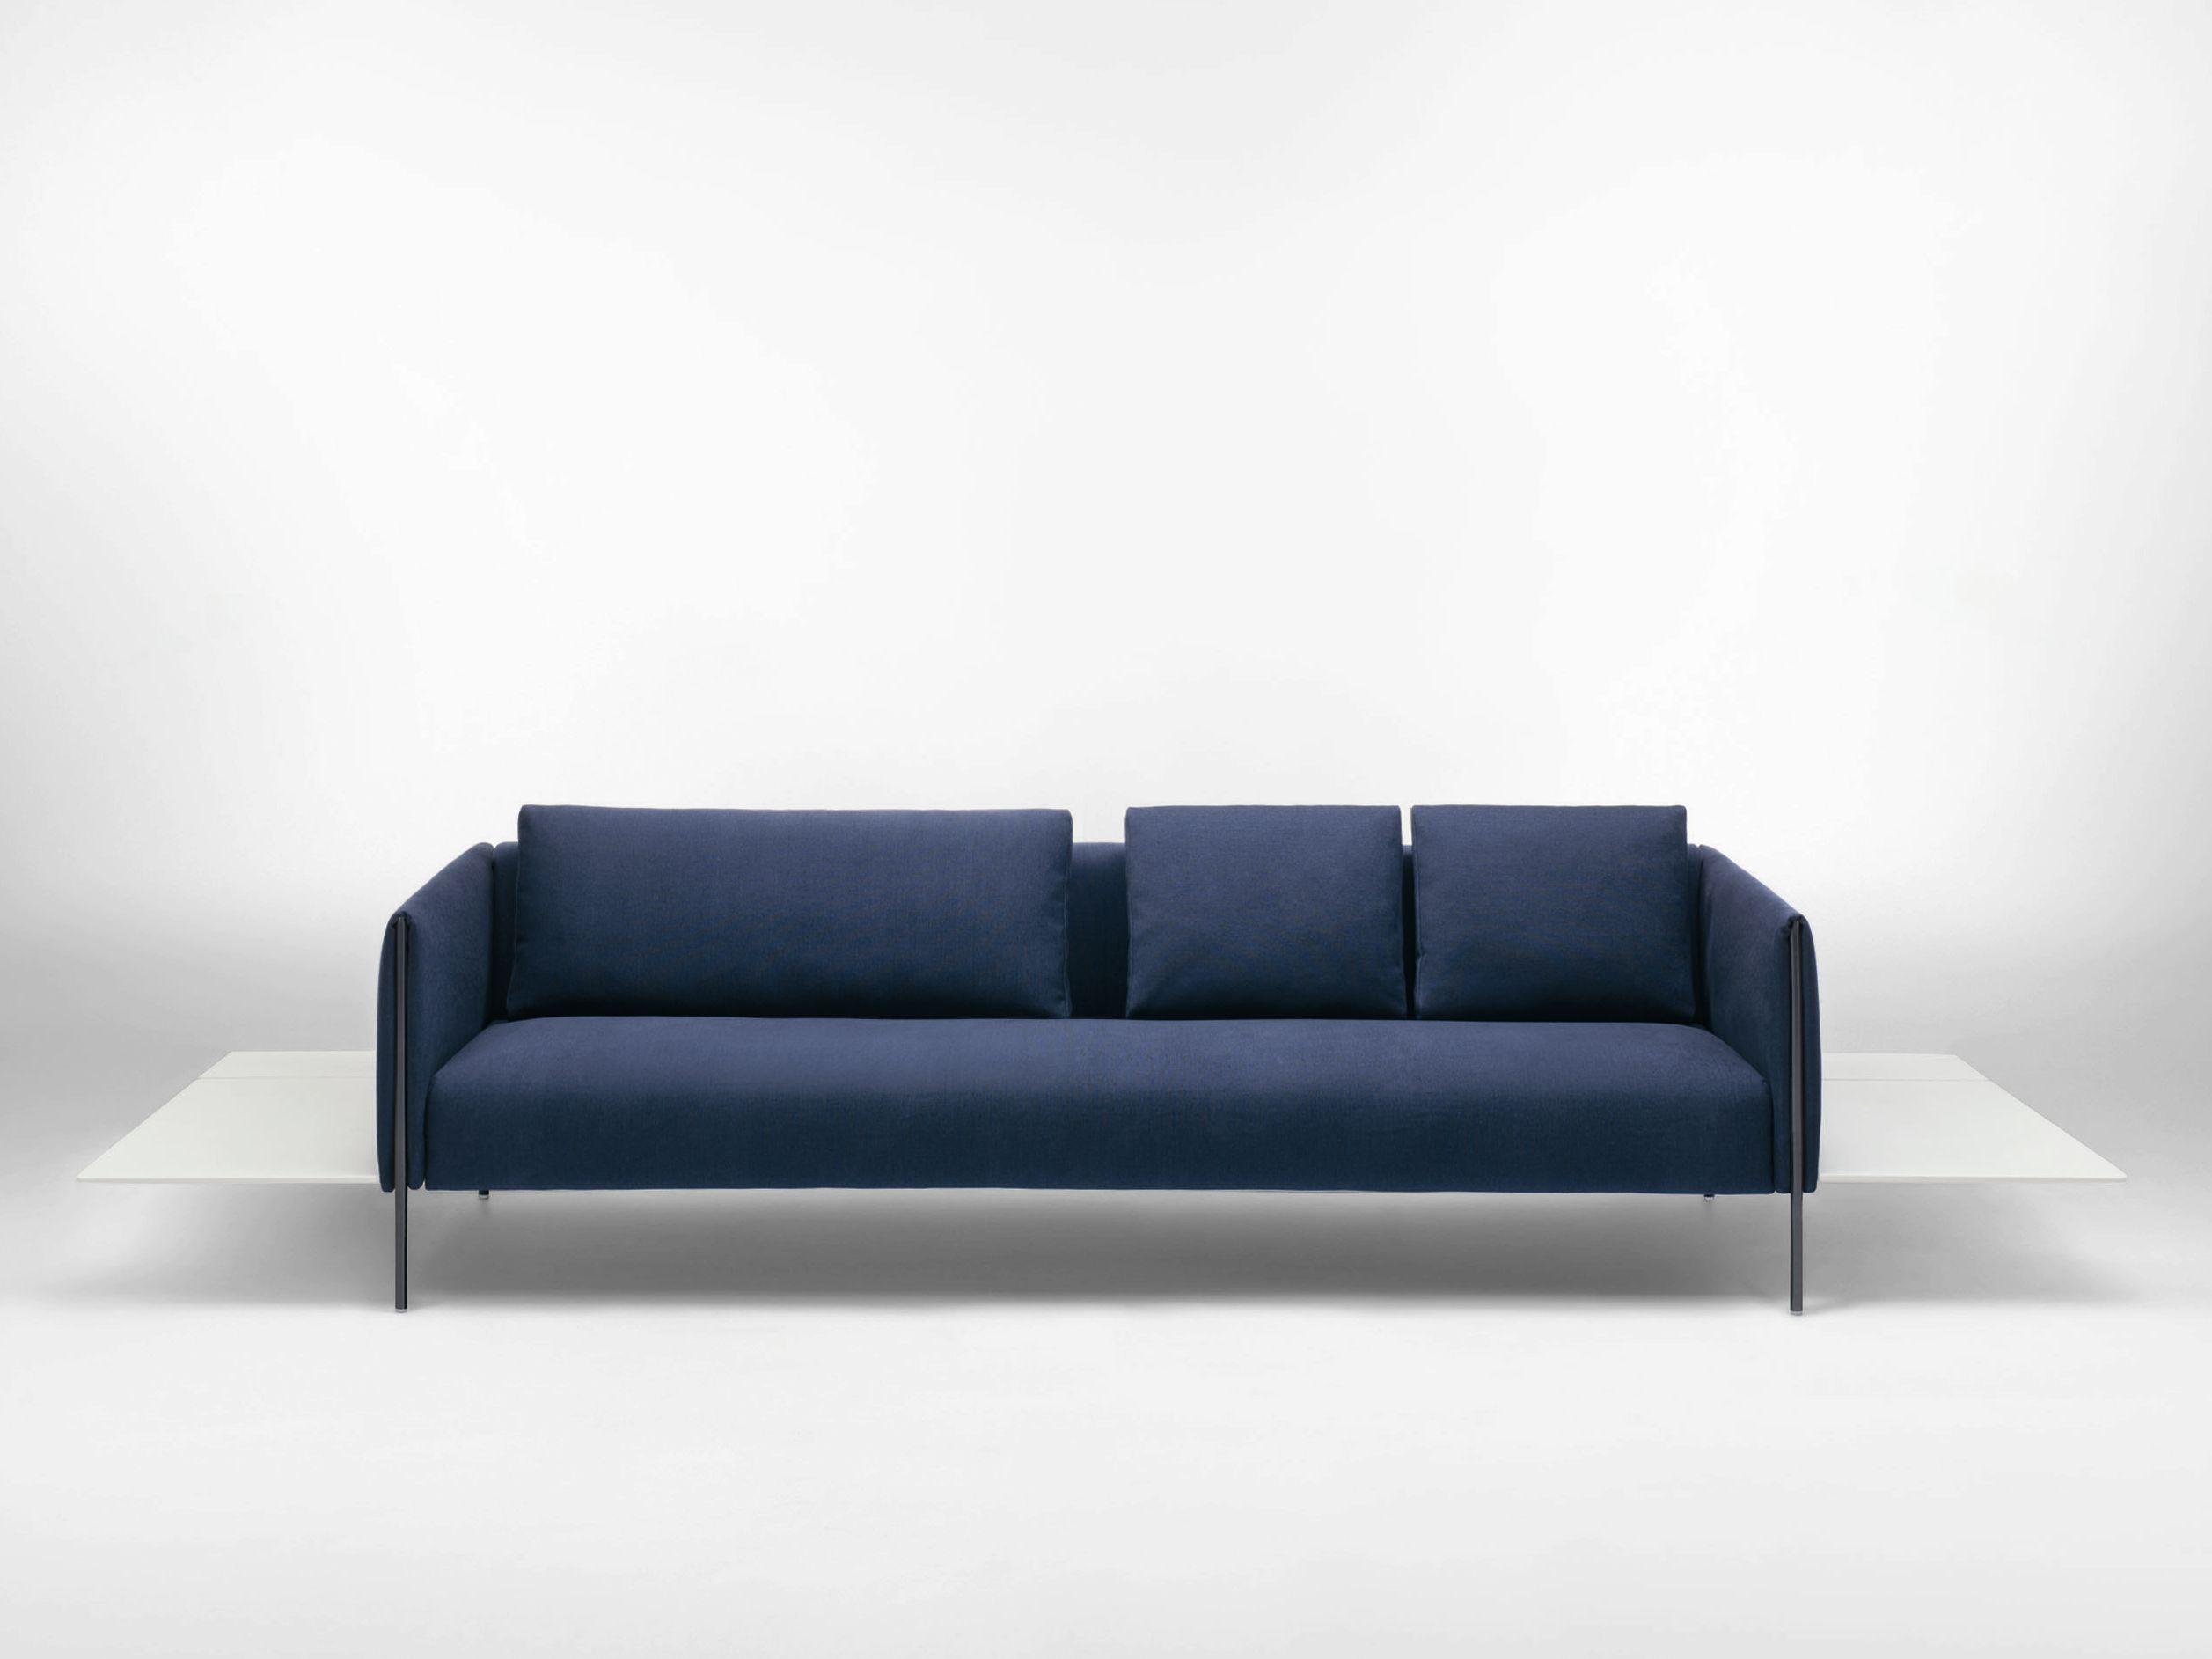 3 Seater Sofa PILLAR   Paola Lenti